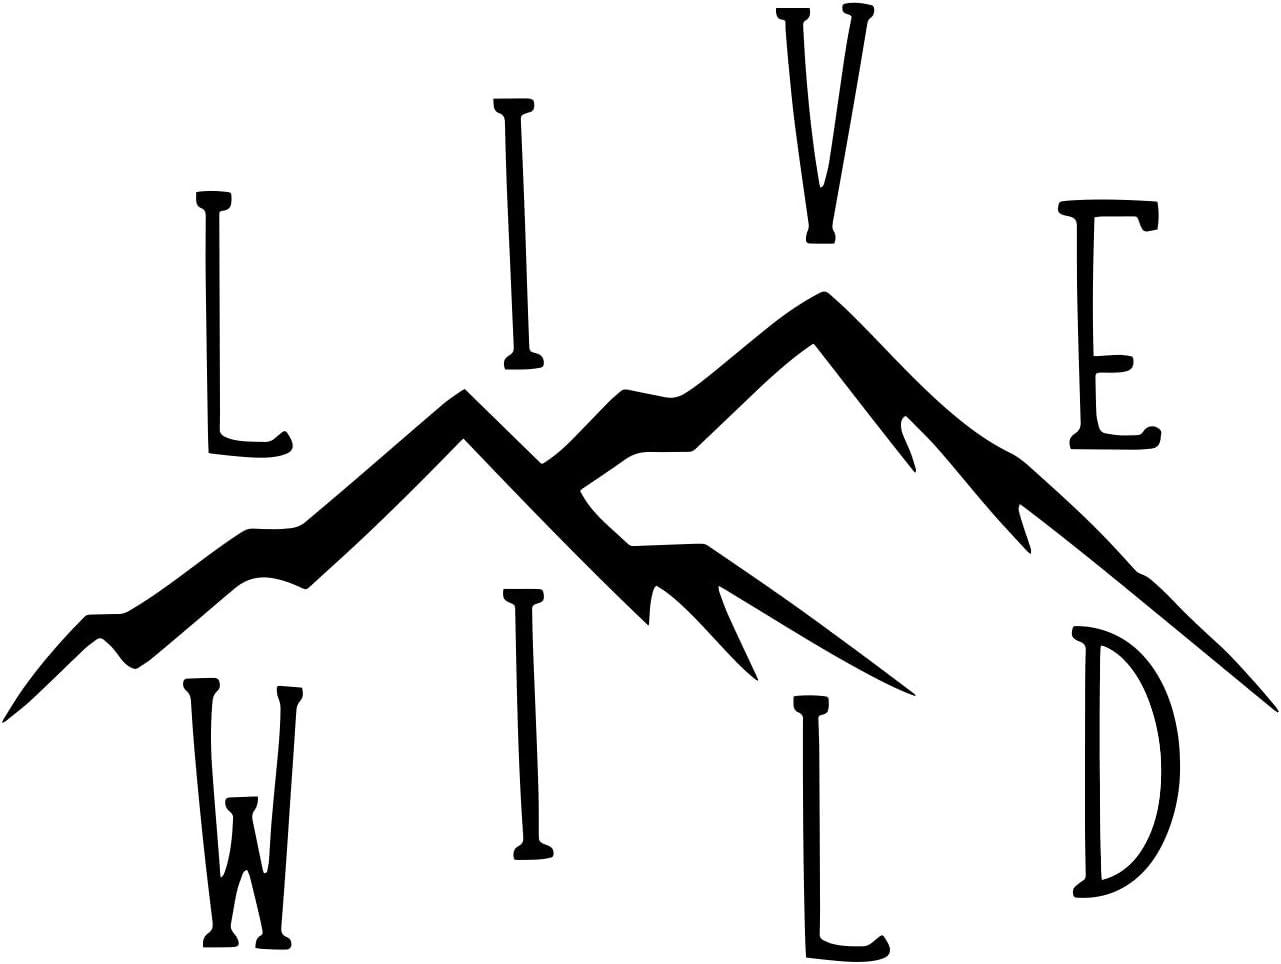 Live Wild Wanderlust Decal Vinyl Sticker Cars Trucks Vans Walls Laptop   Black   8